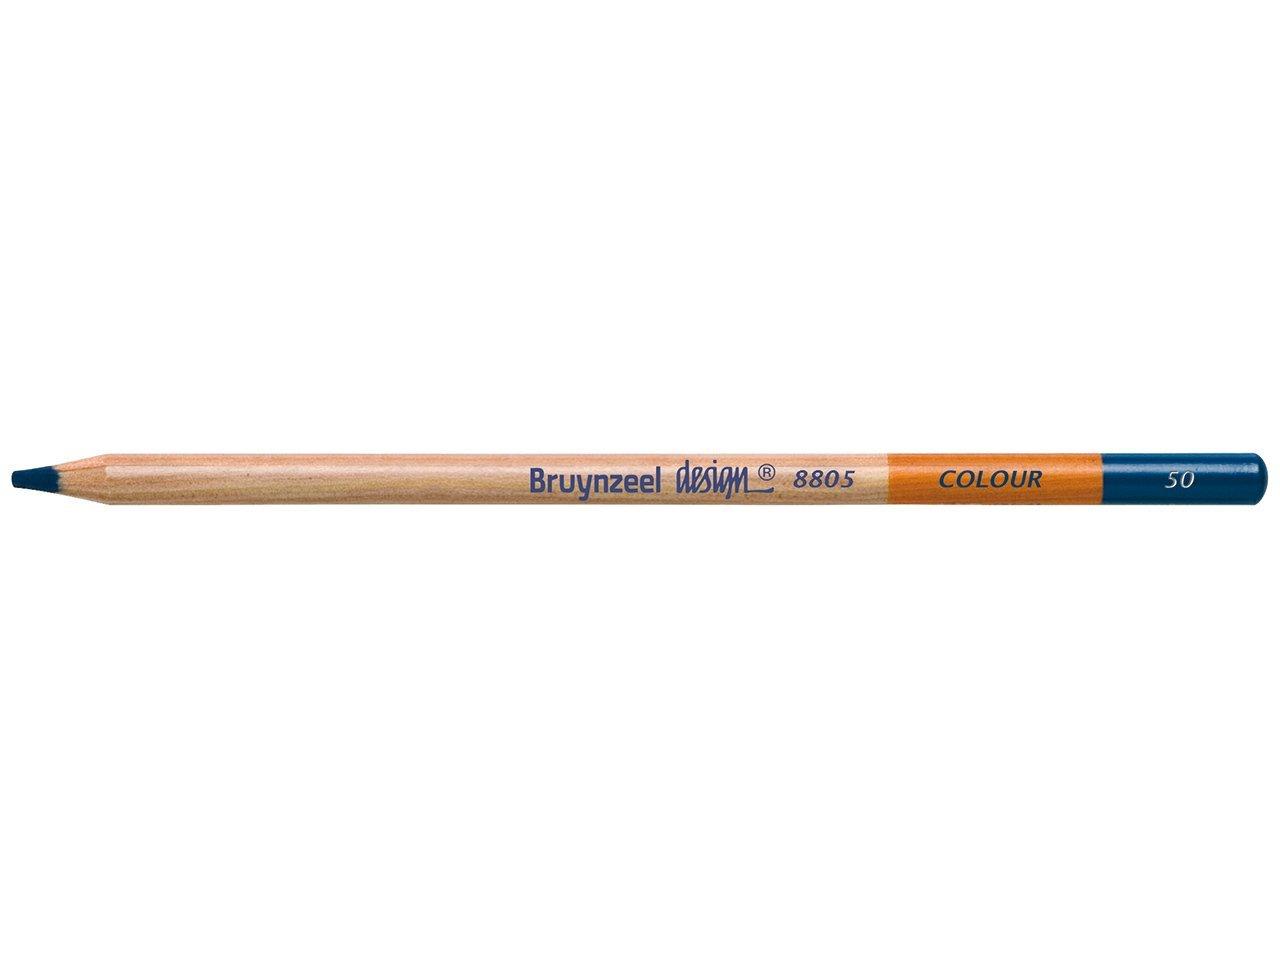 Bruynzeel Pencil - 50 Ultramarine